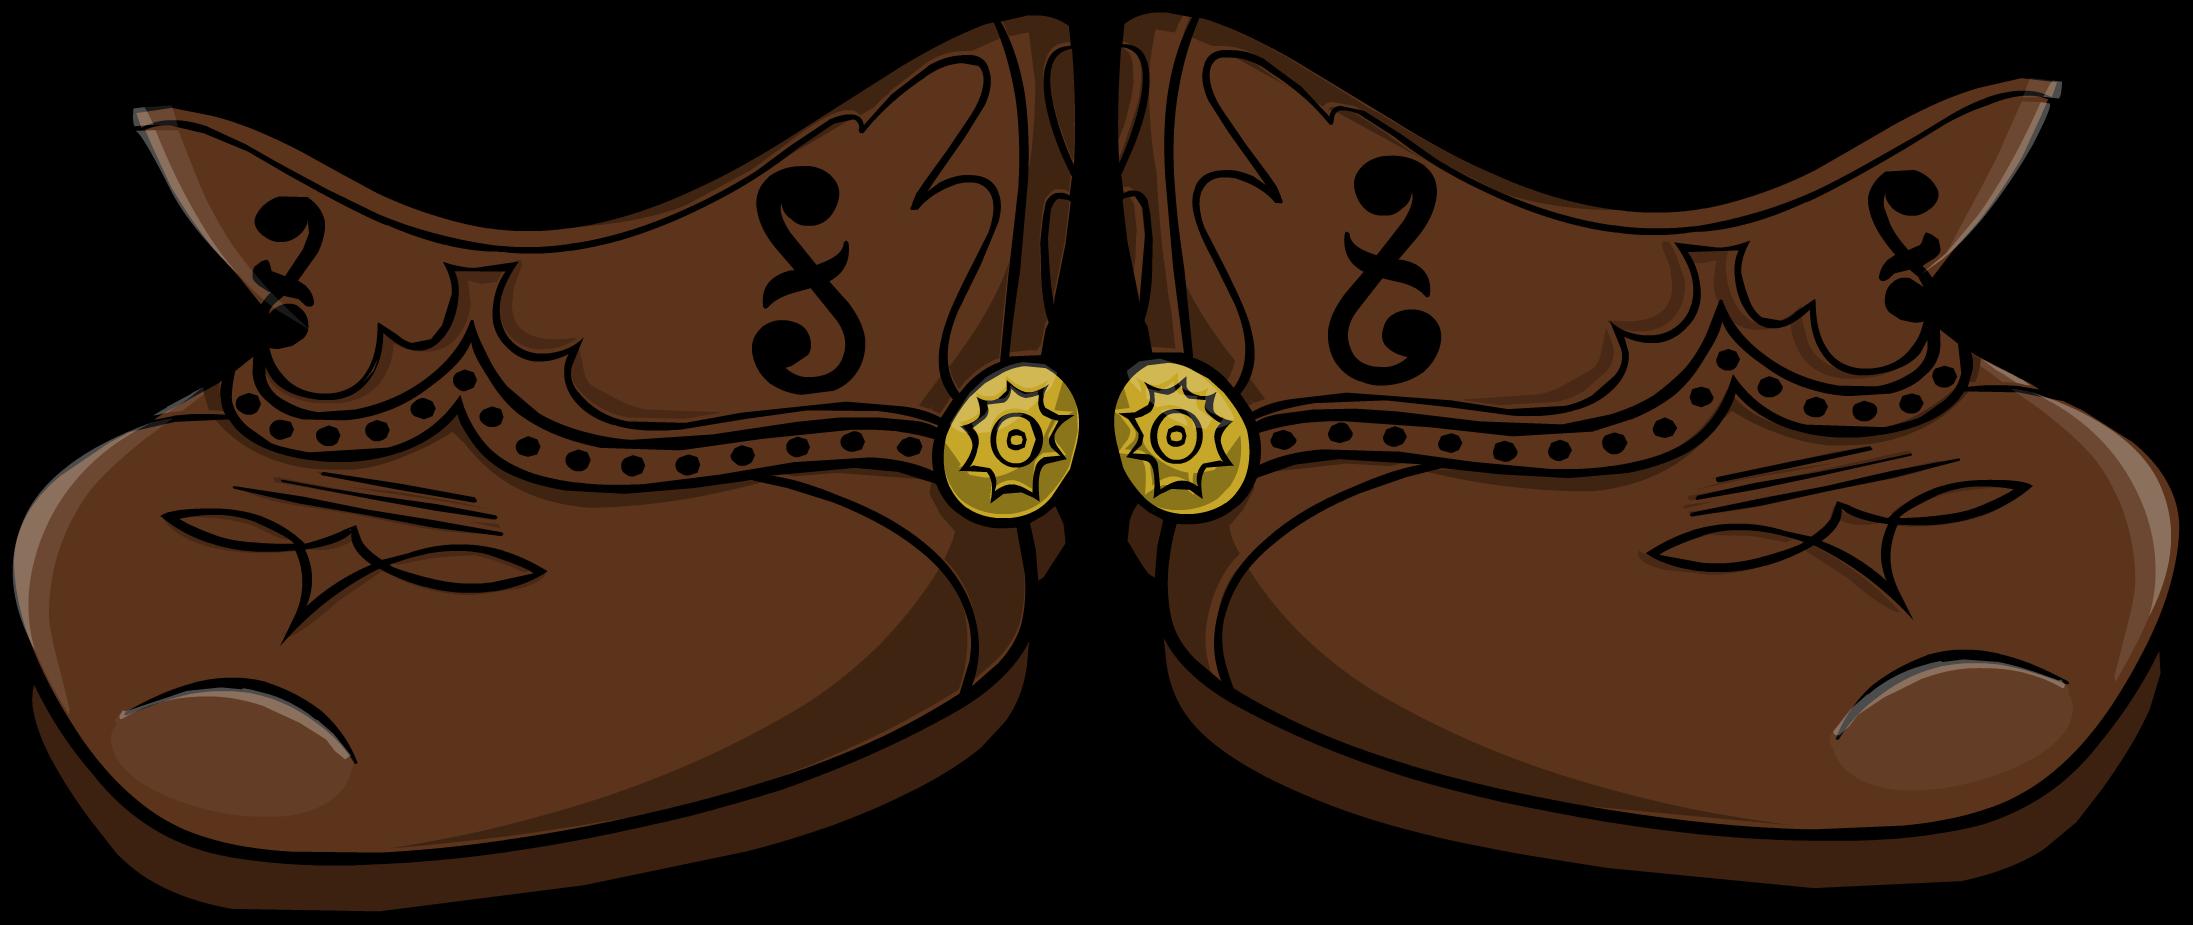 G Billy Cowboy Boots